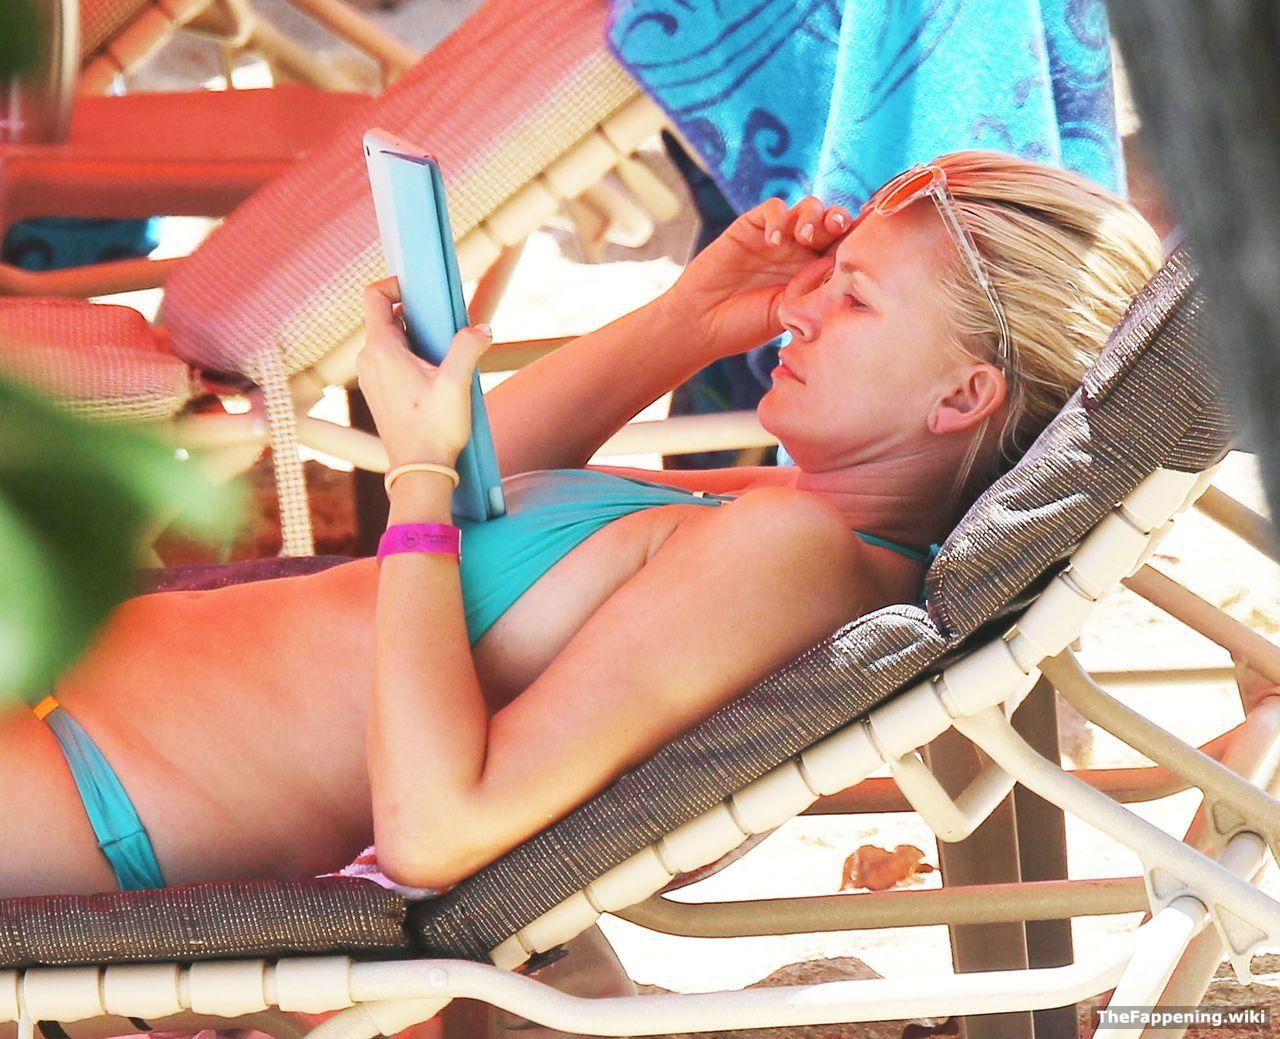 Natasha Henstridge Nude Pics & Vids - The Fappening